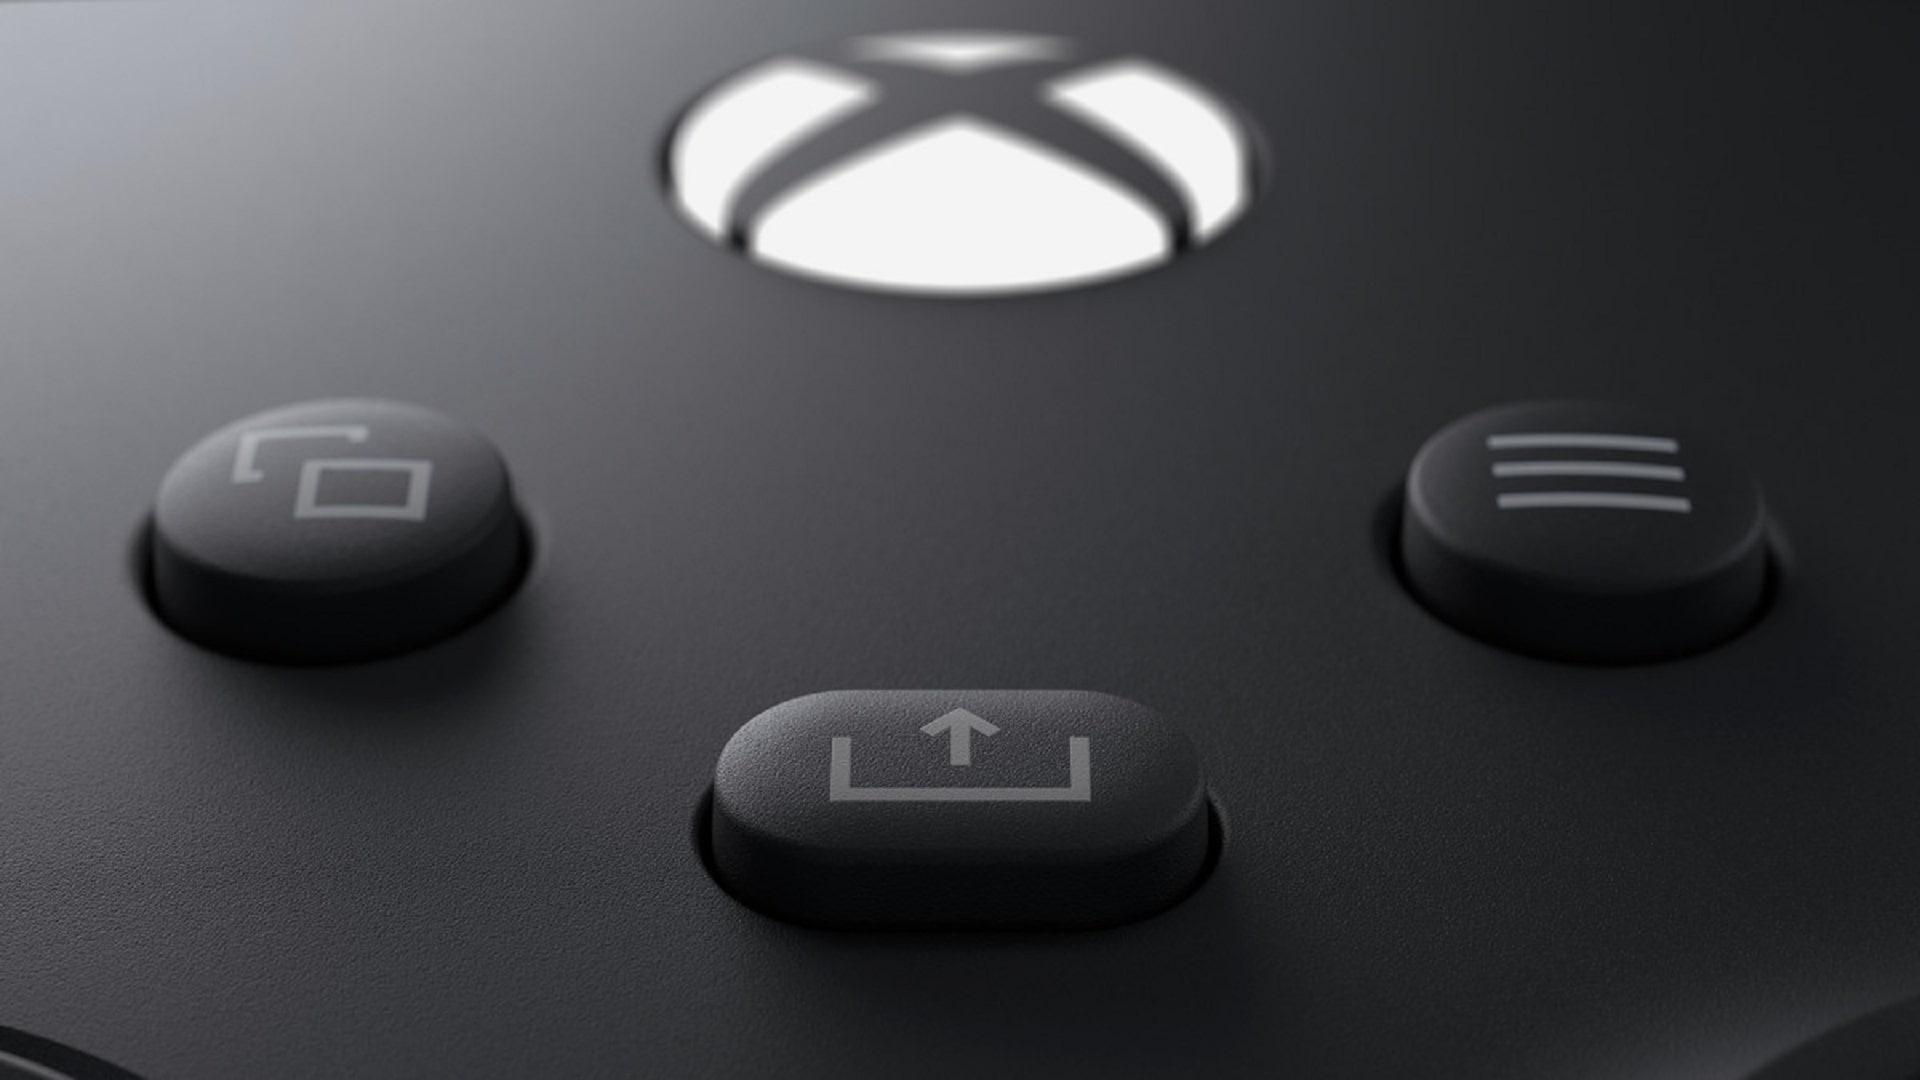 دکمه share در کنترلر ایکس باکس سری ایکس و اس